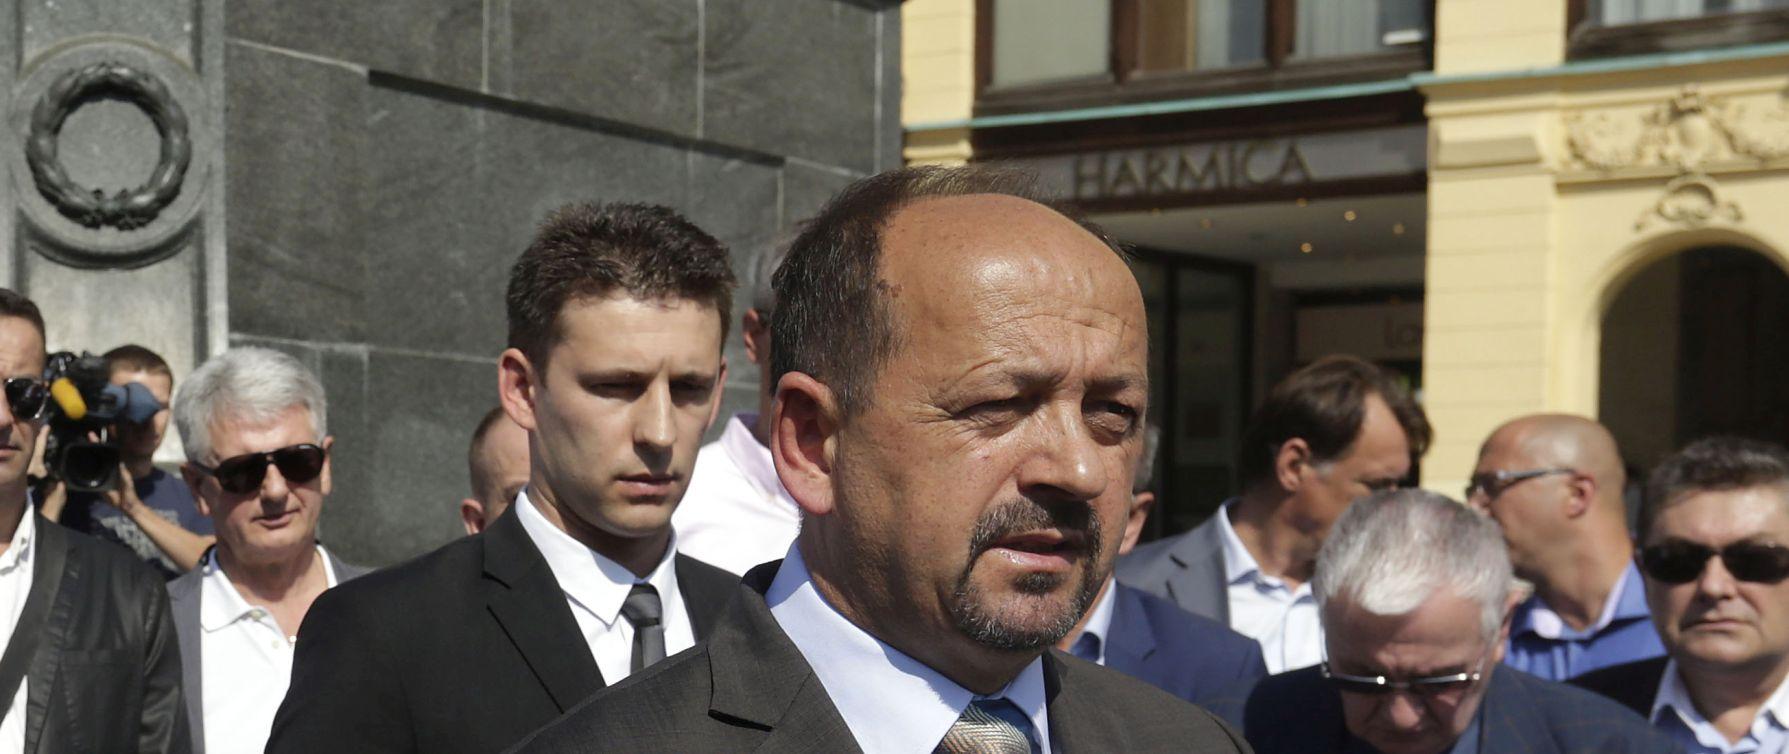 LOVRINOVIĆ: Napad HNB-a na SDP oko 'švicarca' dobro je smišljeni scenarij